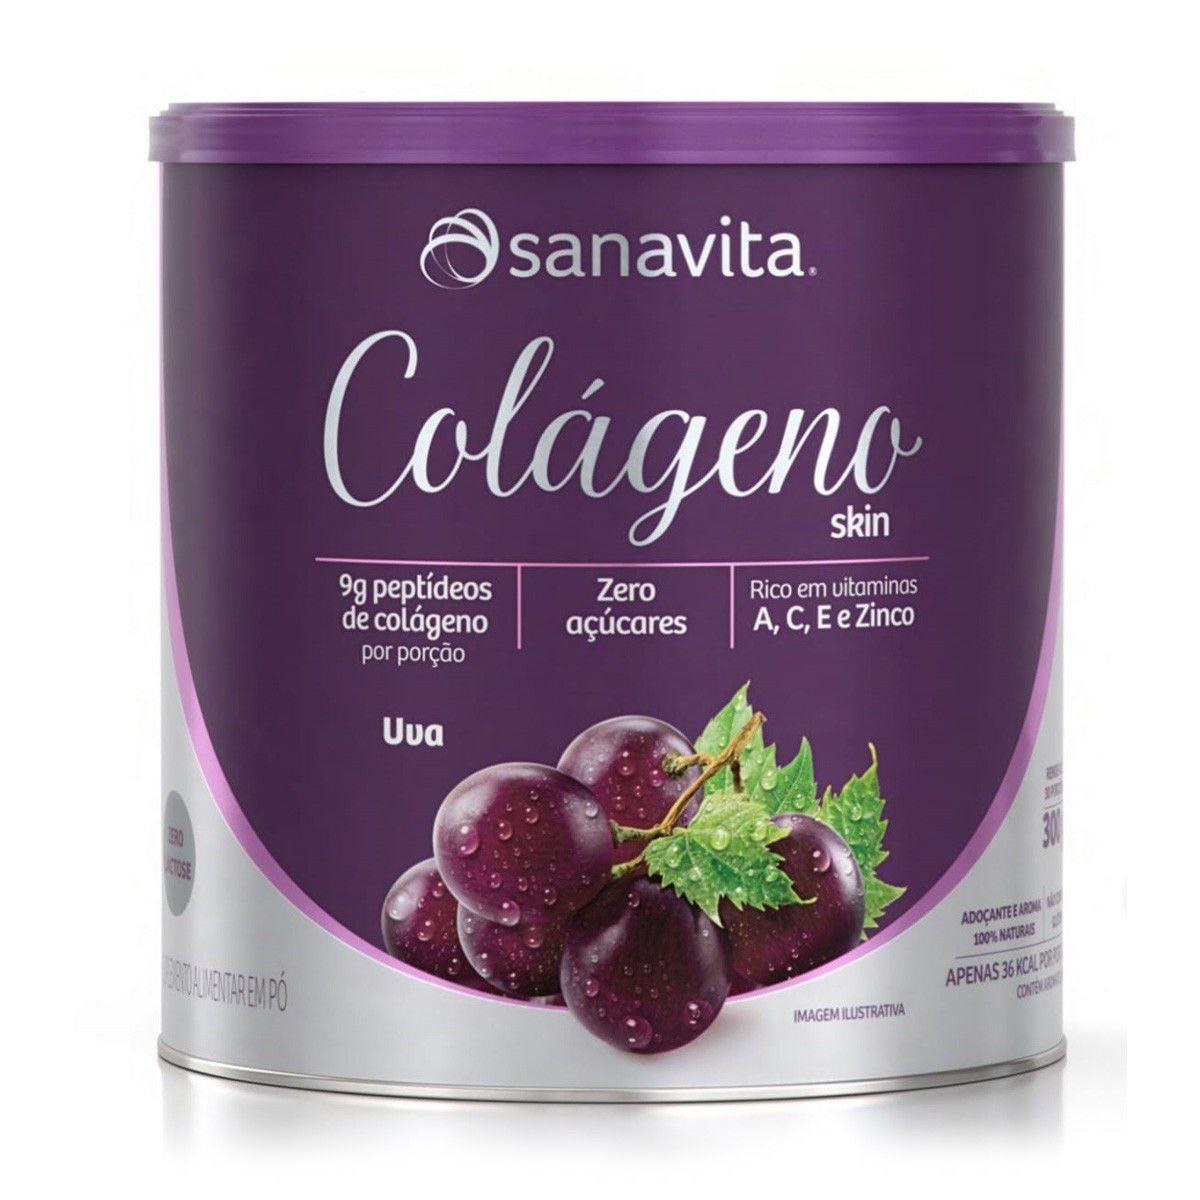 Colágeno Skin Sanavita - 300g